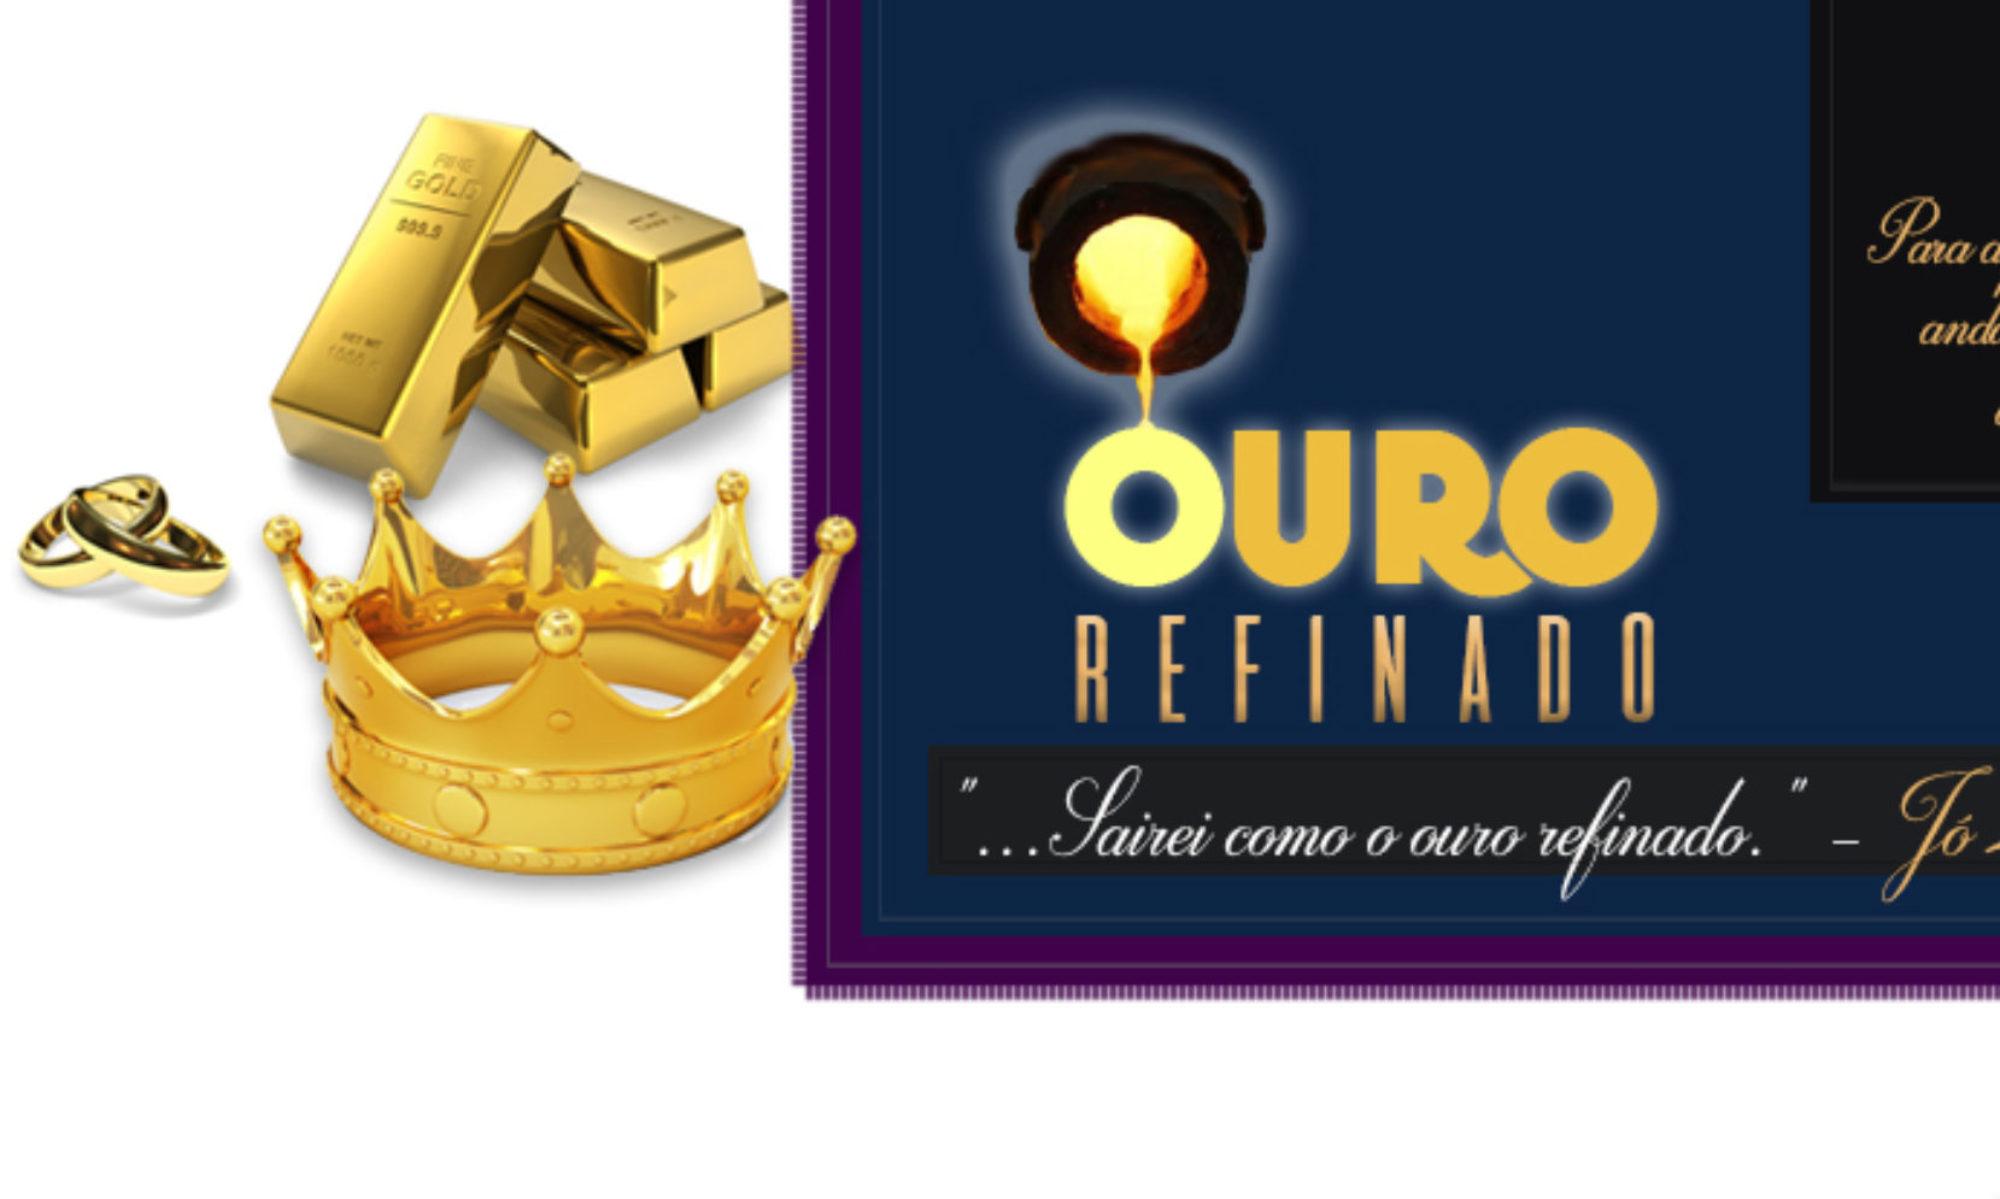 Ouro Refinado